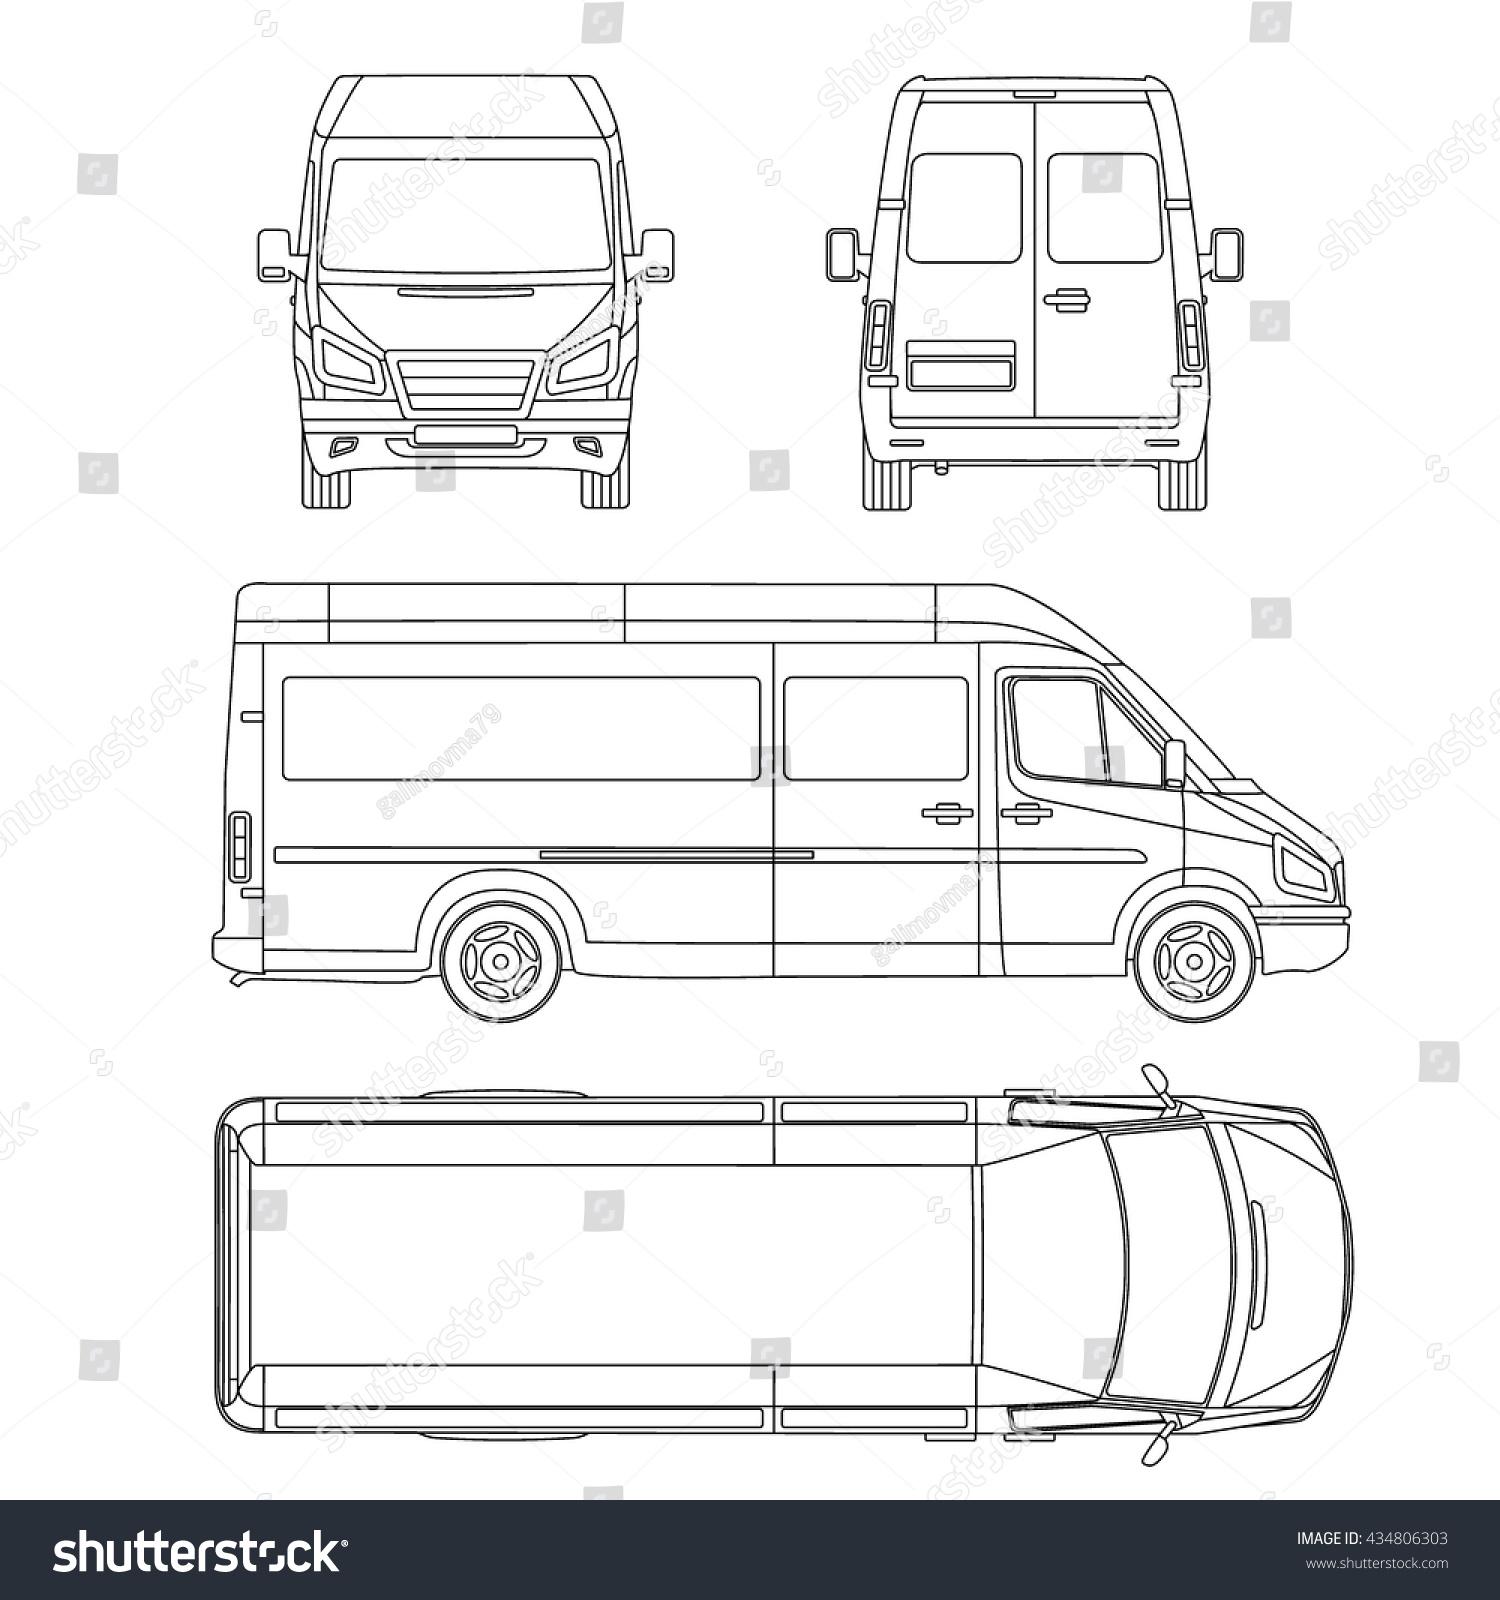 wiring diagram for volkswagen van royalty-free car template. white blank commercial ... damage diagram for 2018 van